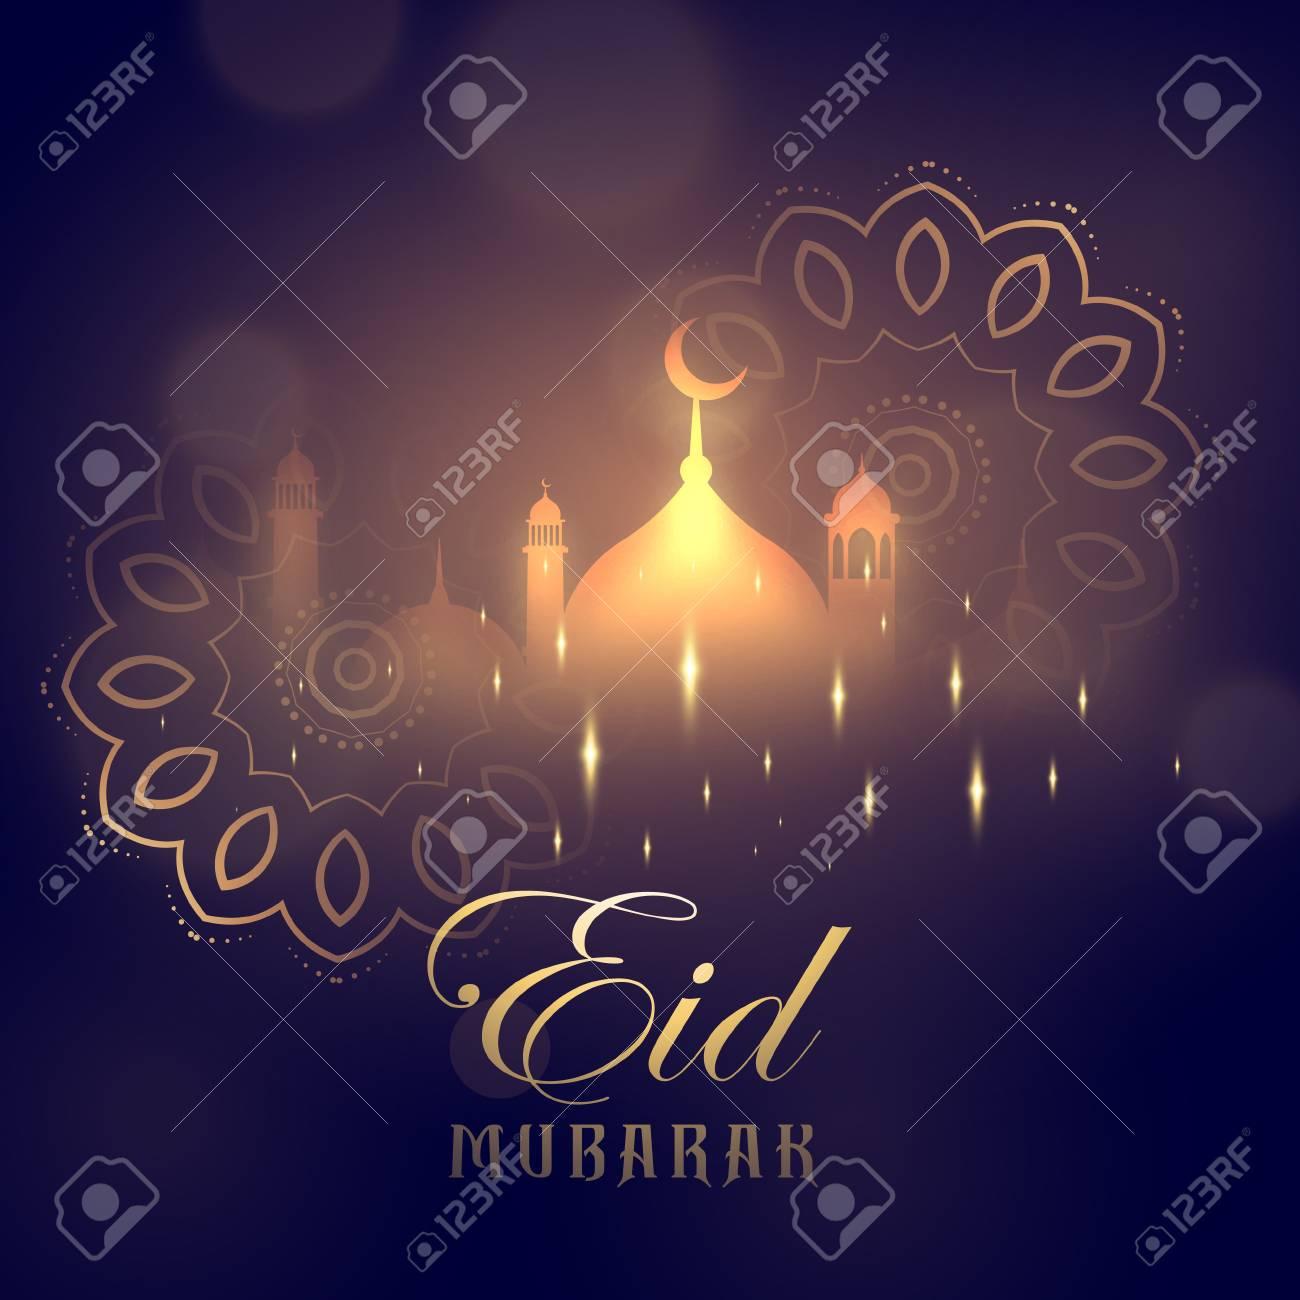 Eid mubarak greeting card design with glowing mosque and mandala eid mubarak greeting card design with glowing mosque and mandala decoration stock vector 78063450 m4hsunfo